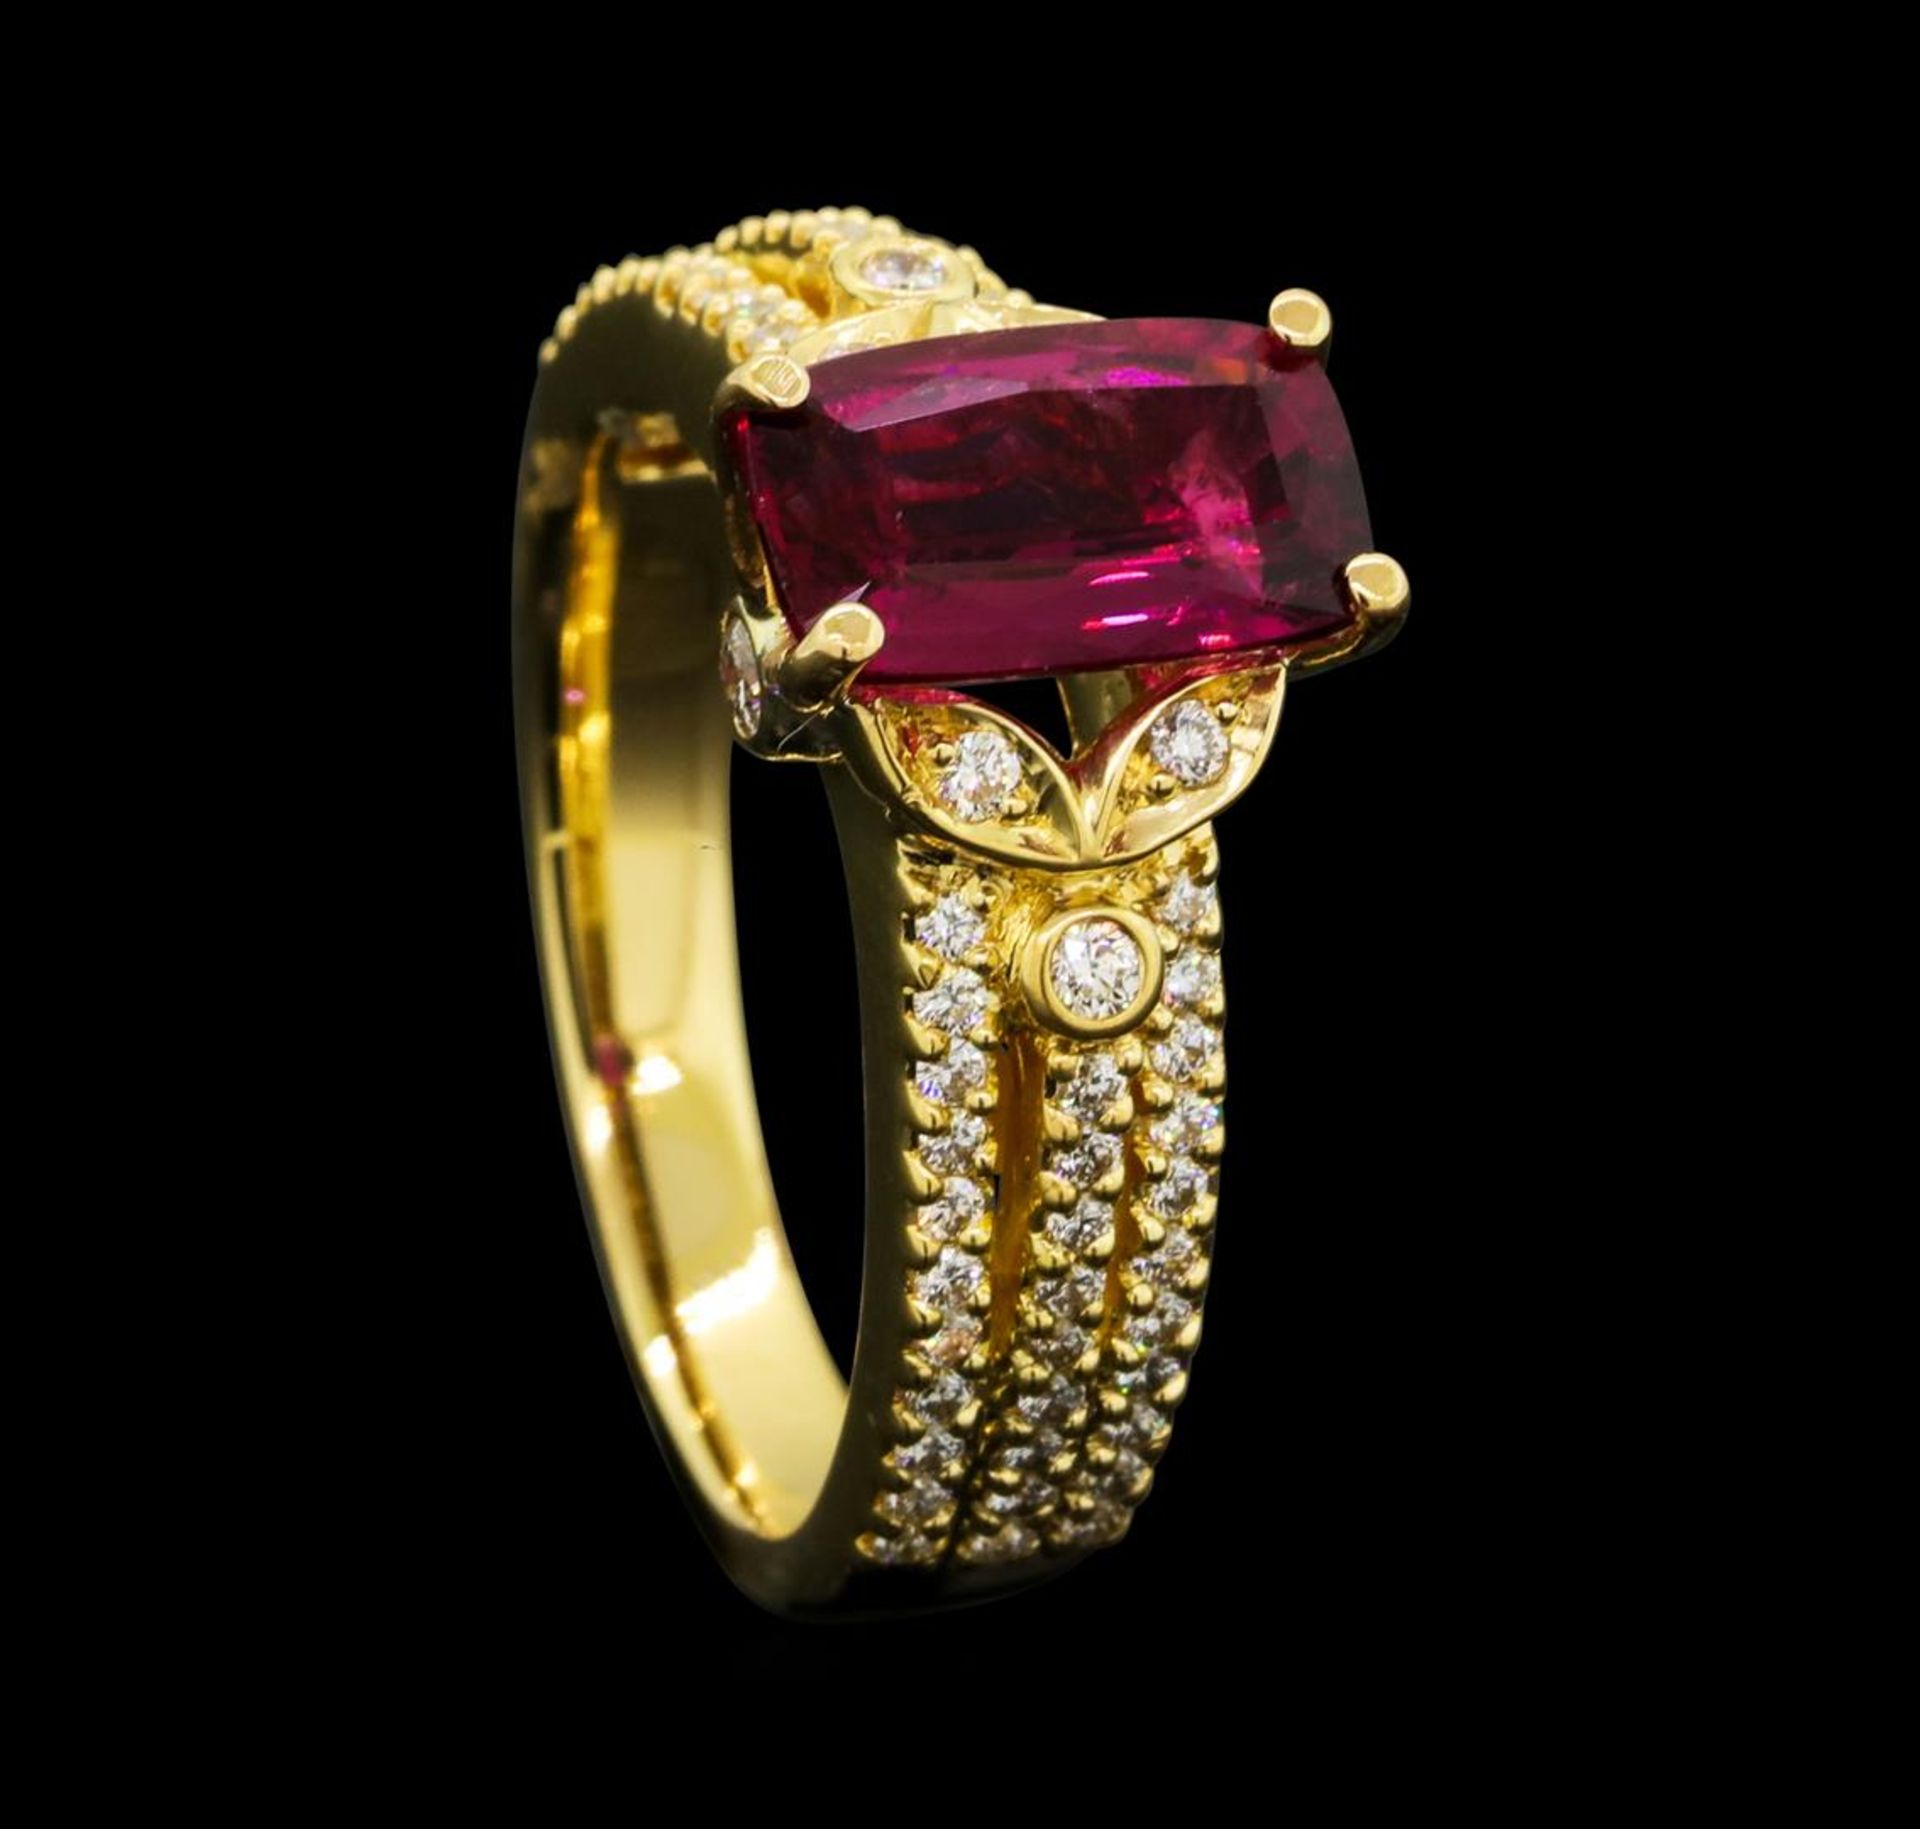 1.50 ct Pink Tourmaling And Diamond Ring - 18KT Yellow Gold - Image 4 of 5